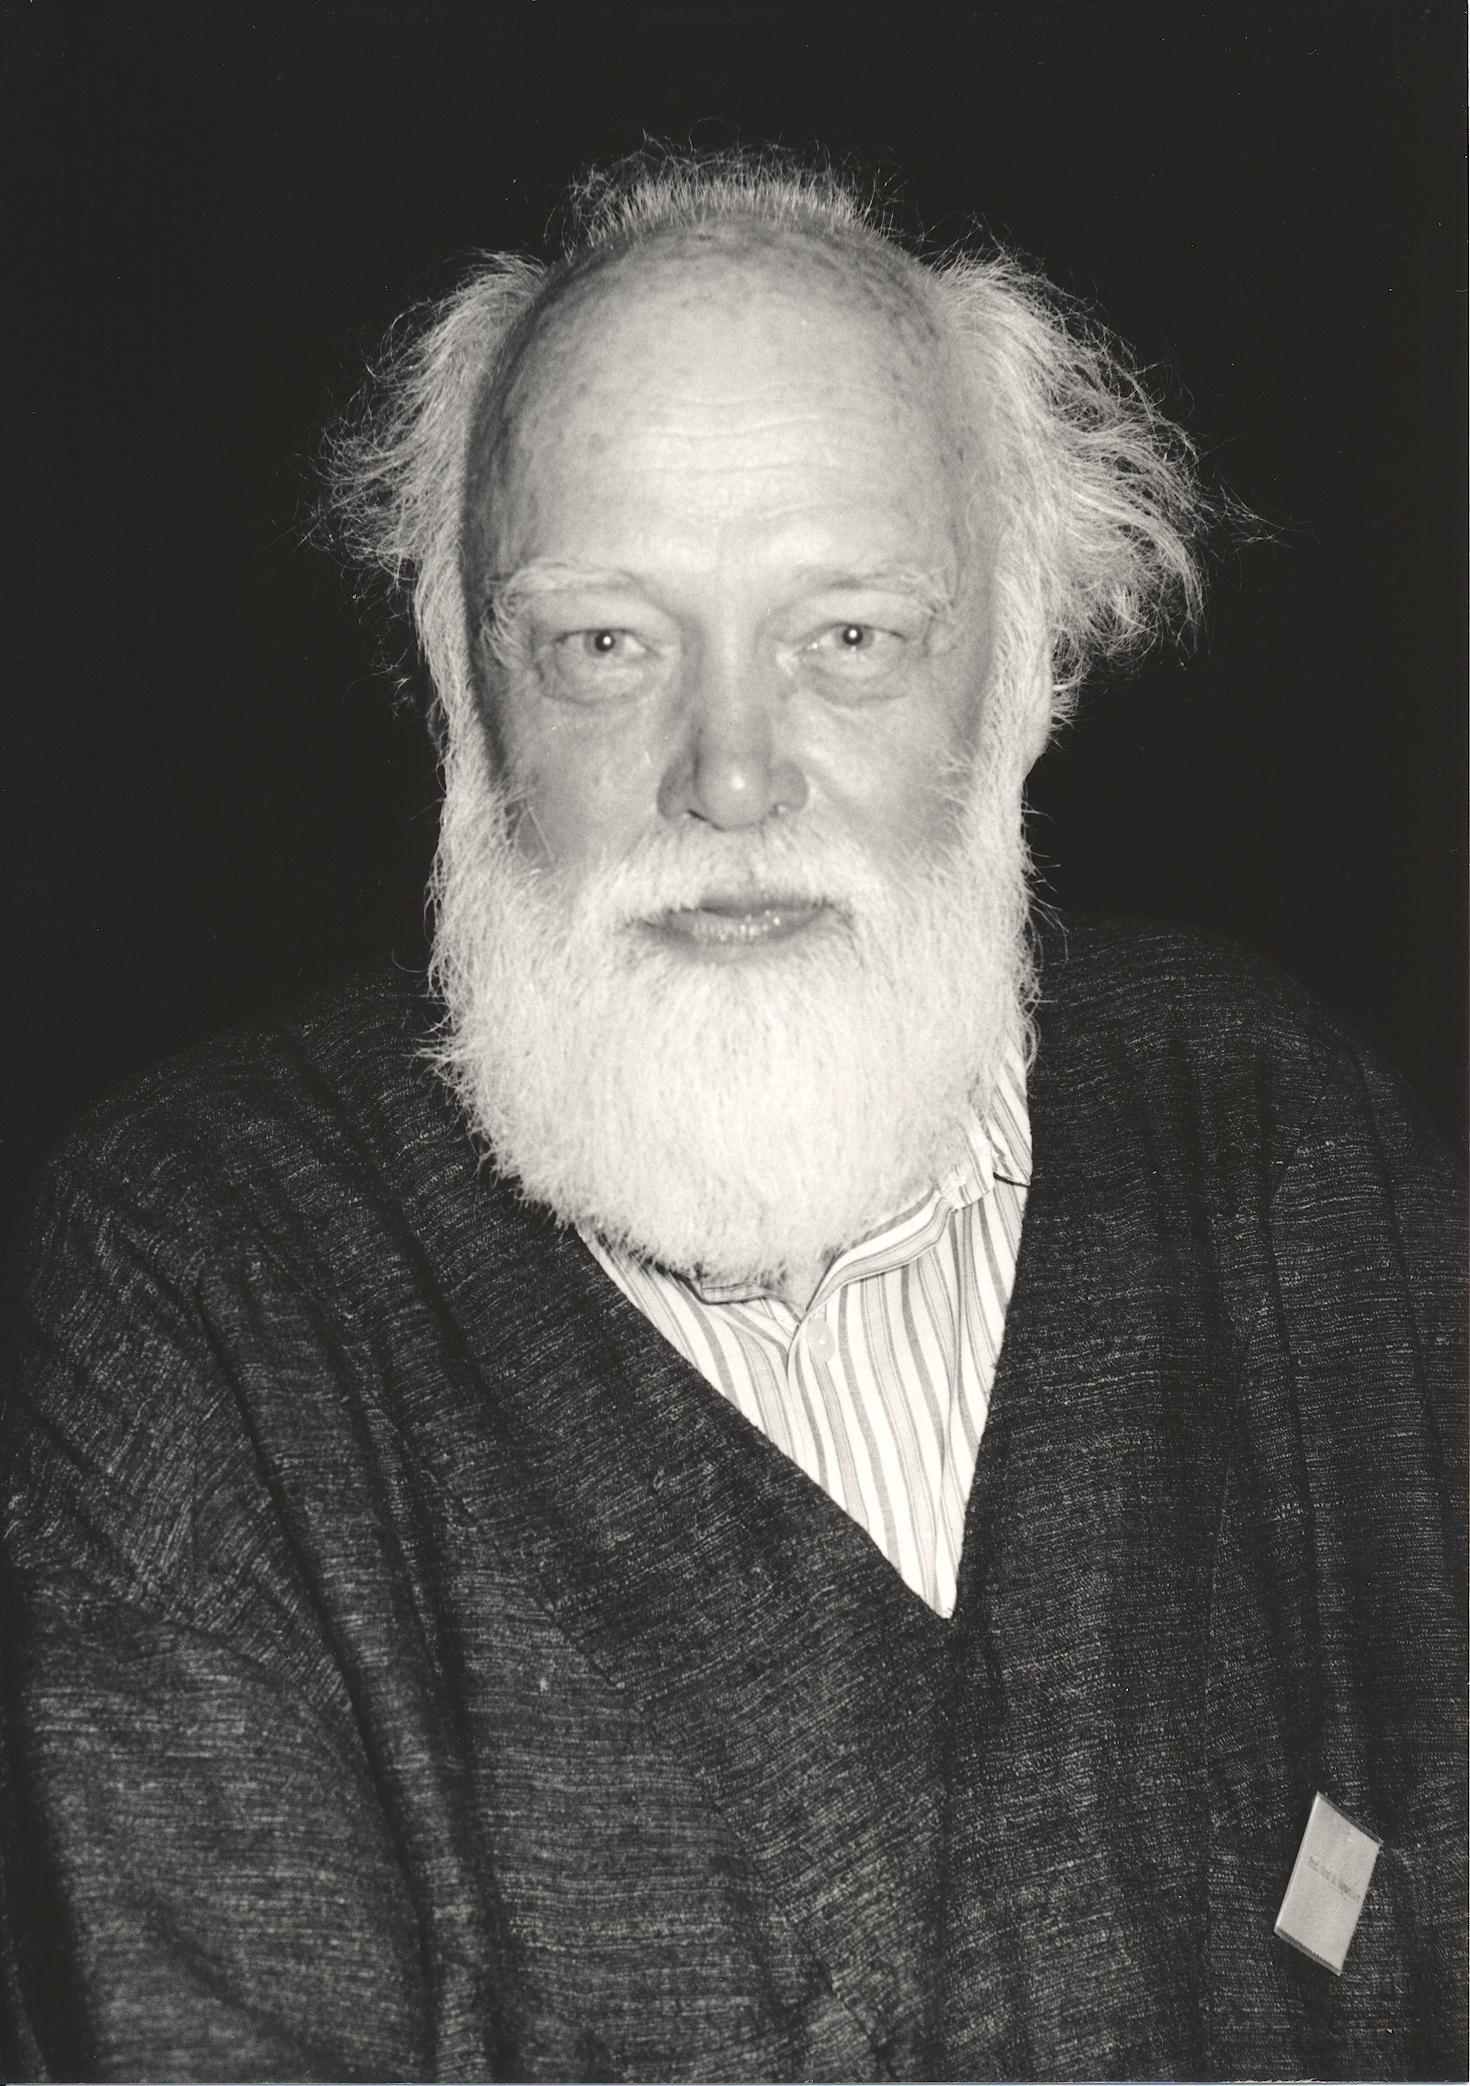 XI. Imago Mundi-Kongress 1987, Innsbruck, Prof. Graf Arnold Keyserling